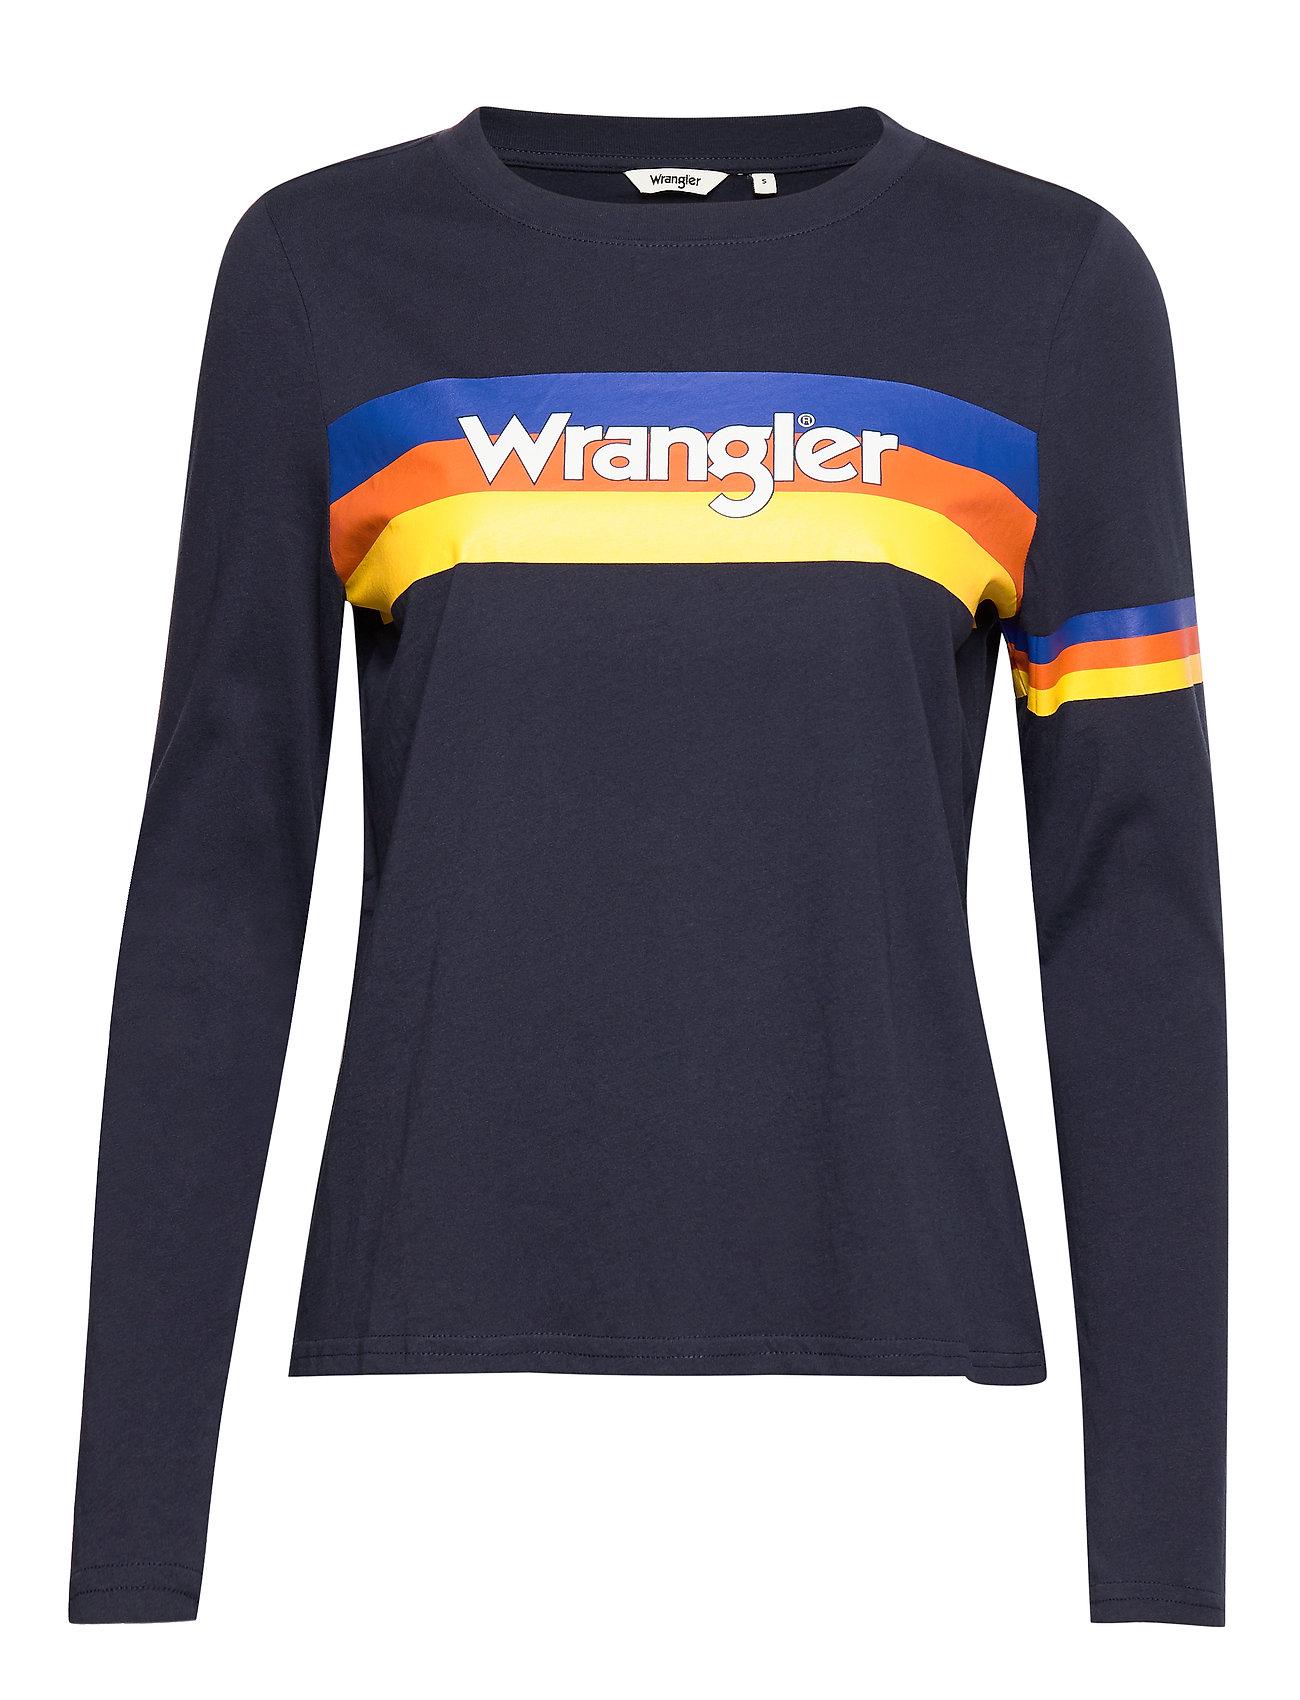 Wrangler RAINBOW TEE NAVY - NAVY